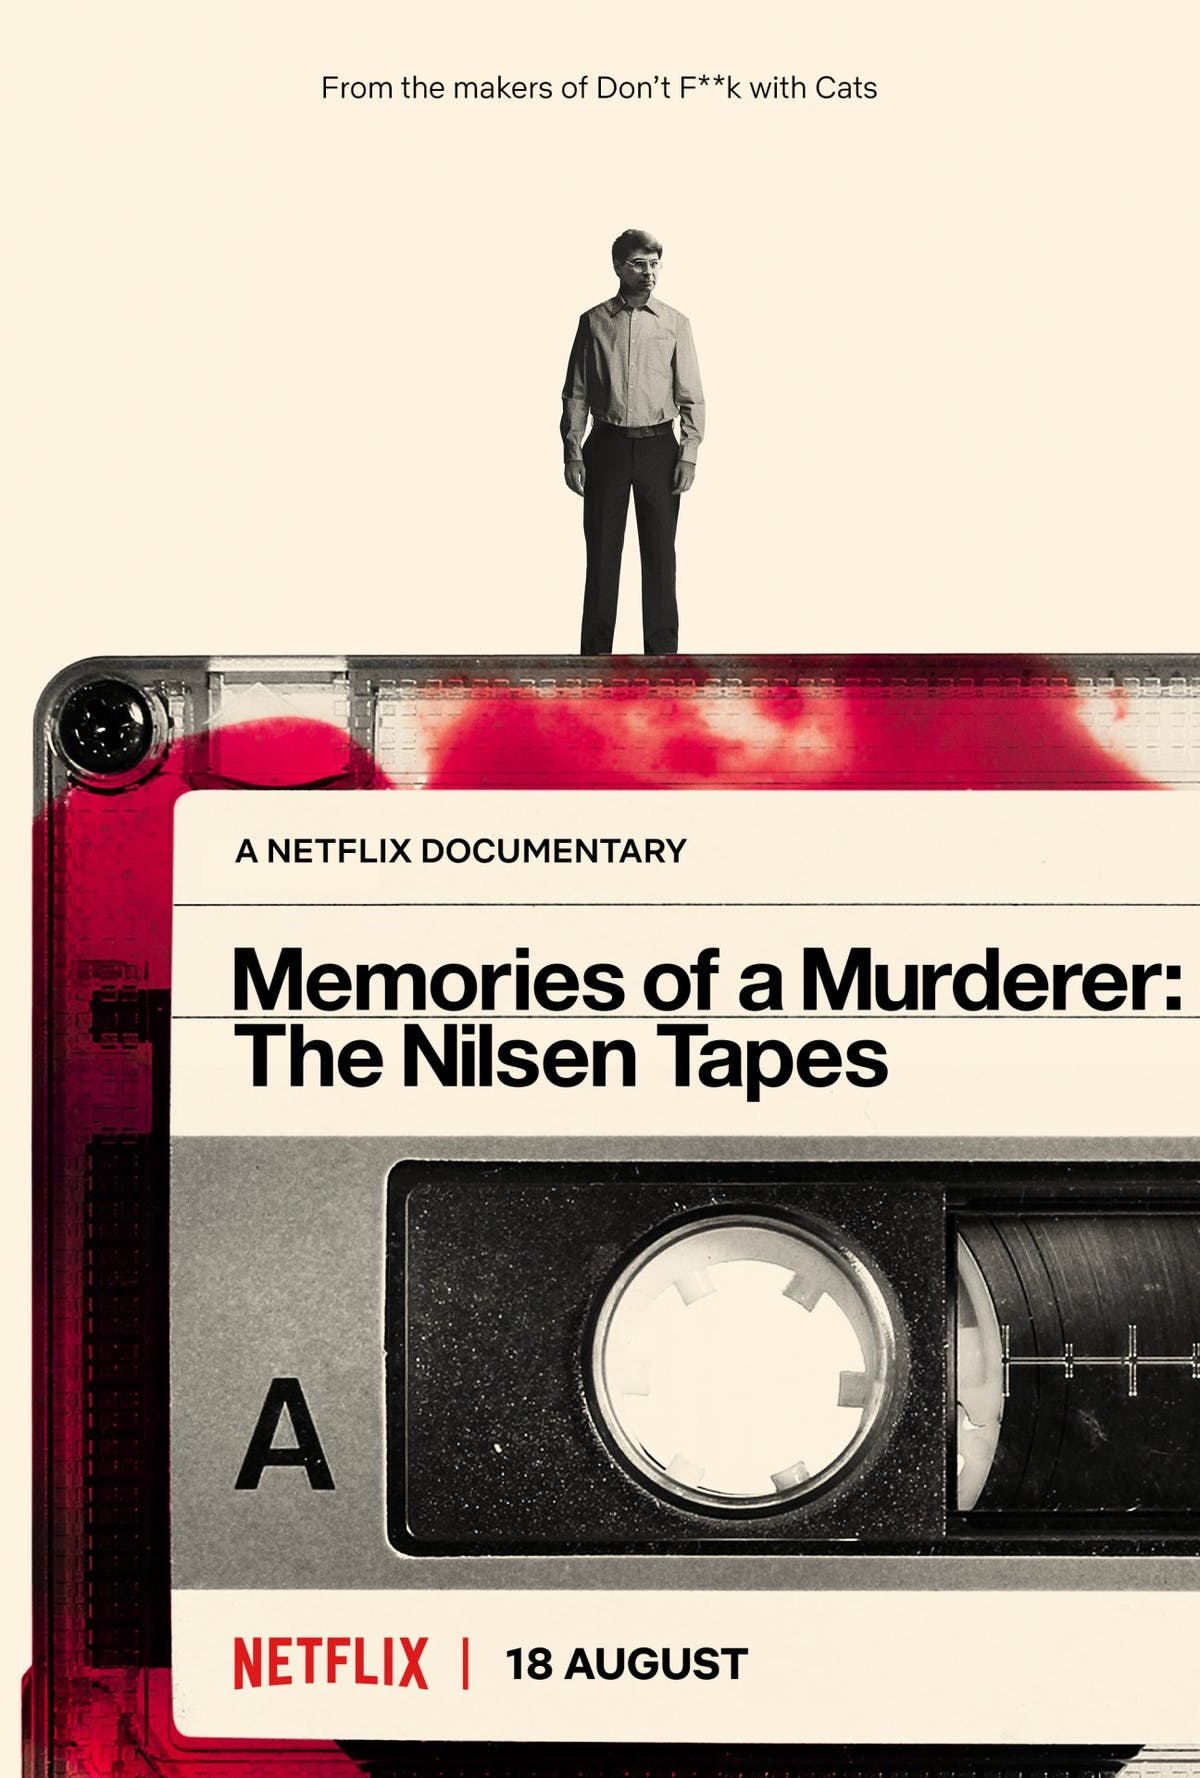 Memories of a Murderer: The Nilsen Tapes